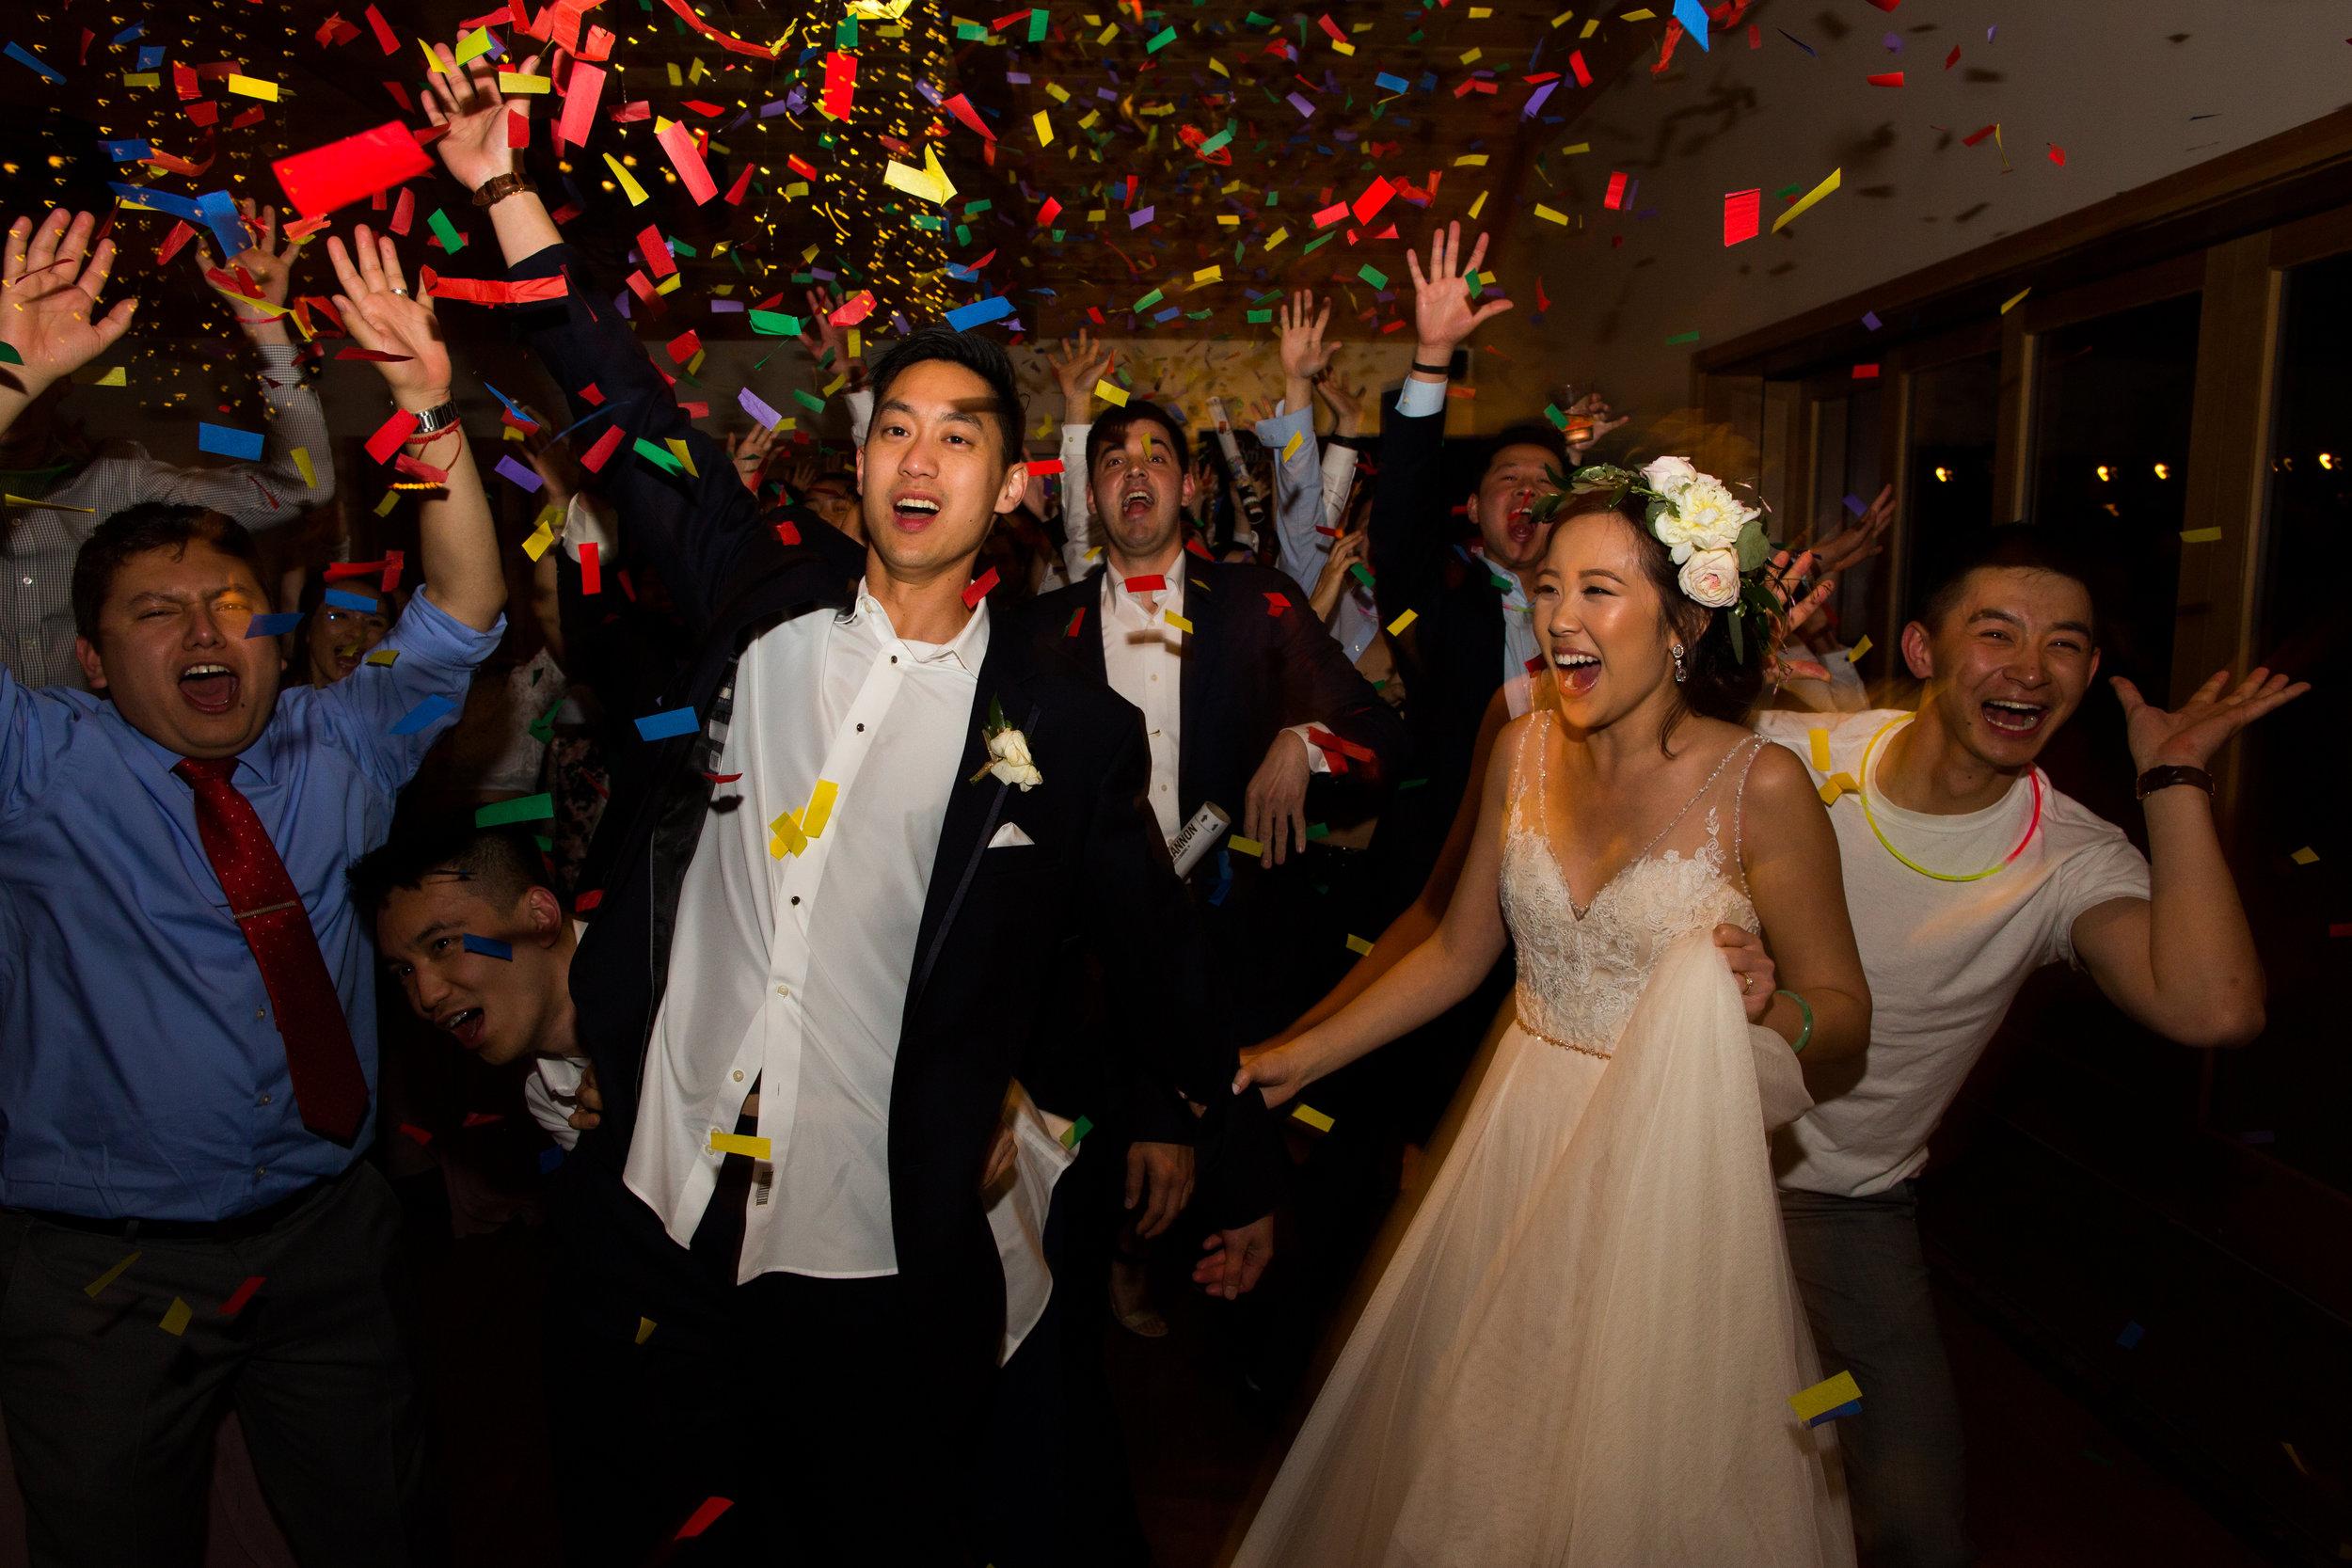 rush creek lodge wedding reception-92.jpg